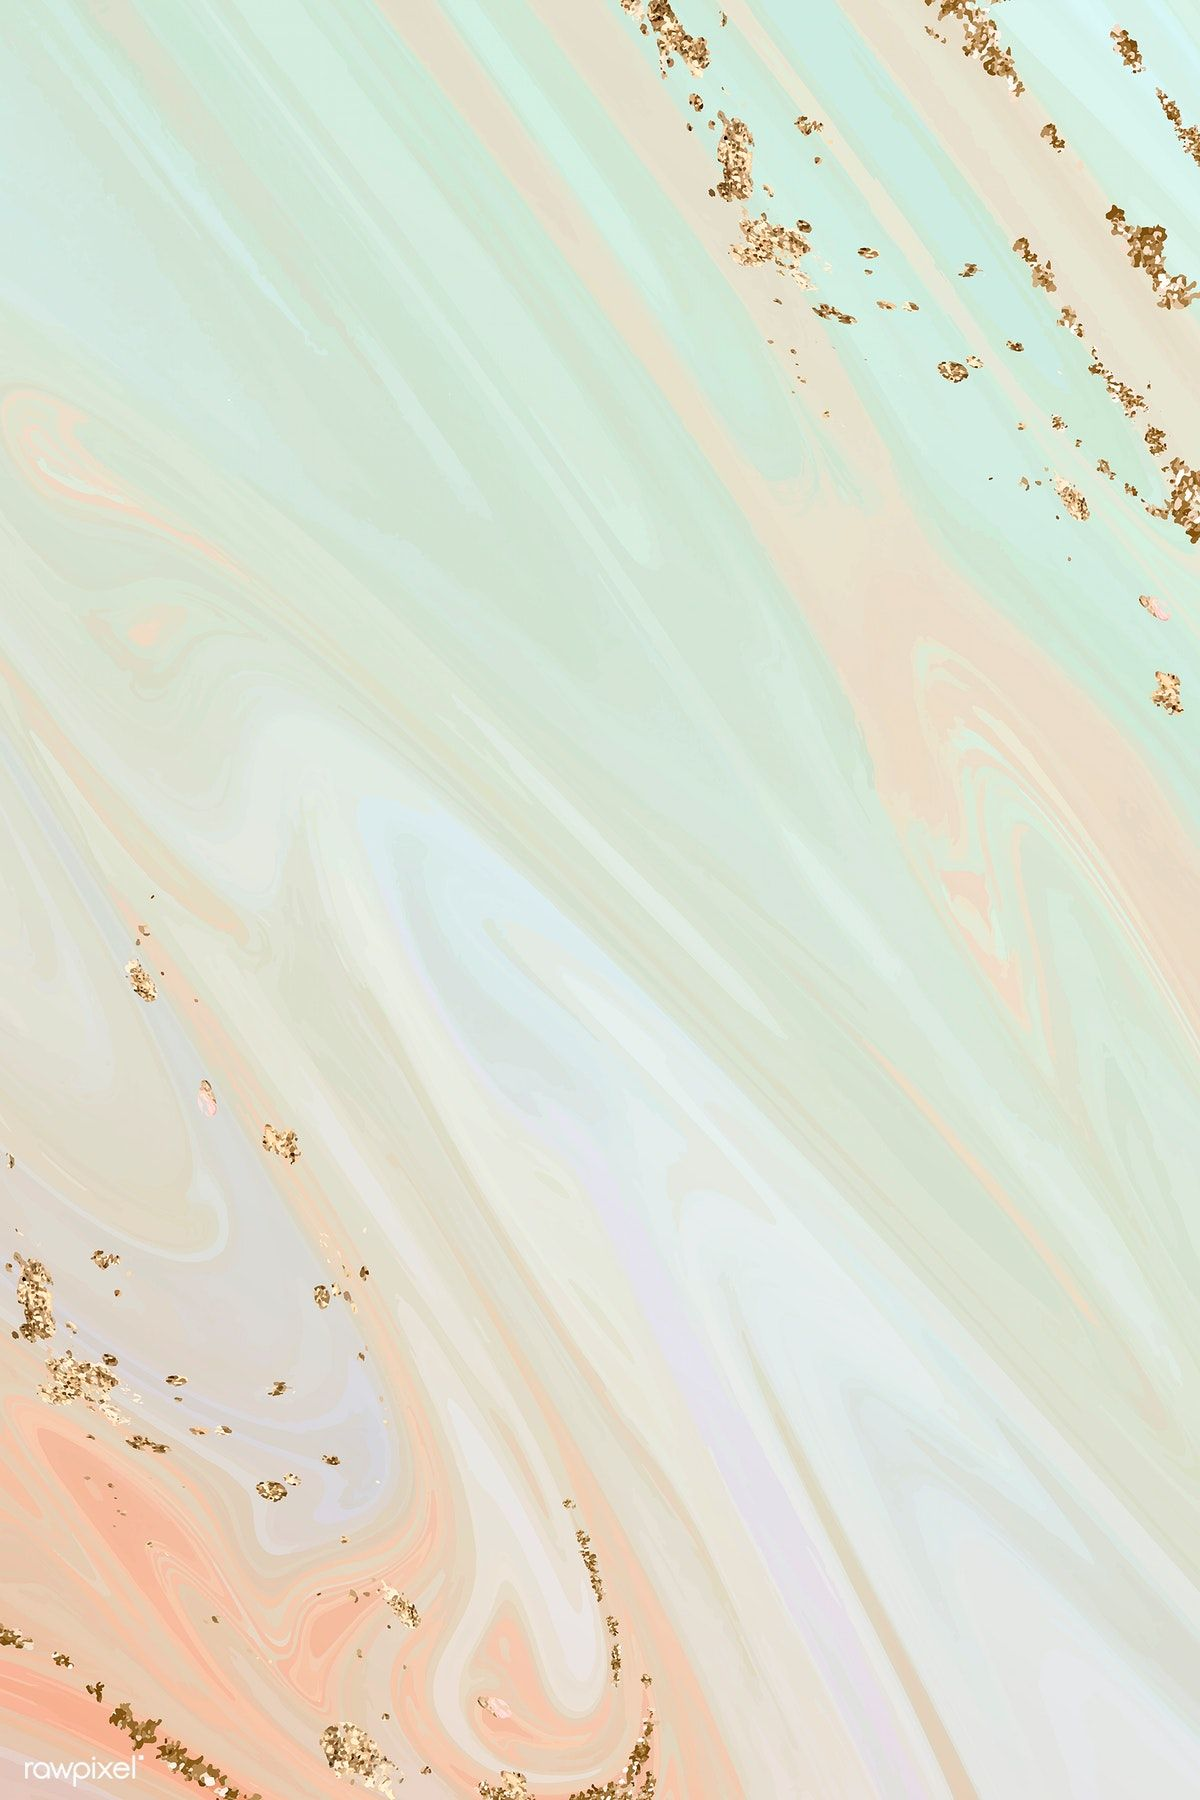 Download premium vector of Greenish fluid patterned background vector